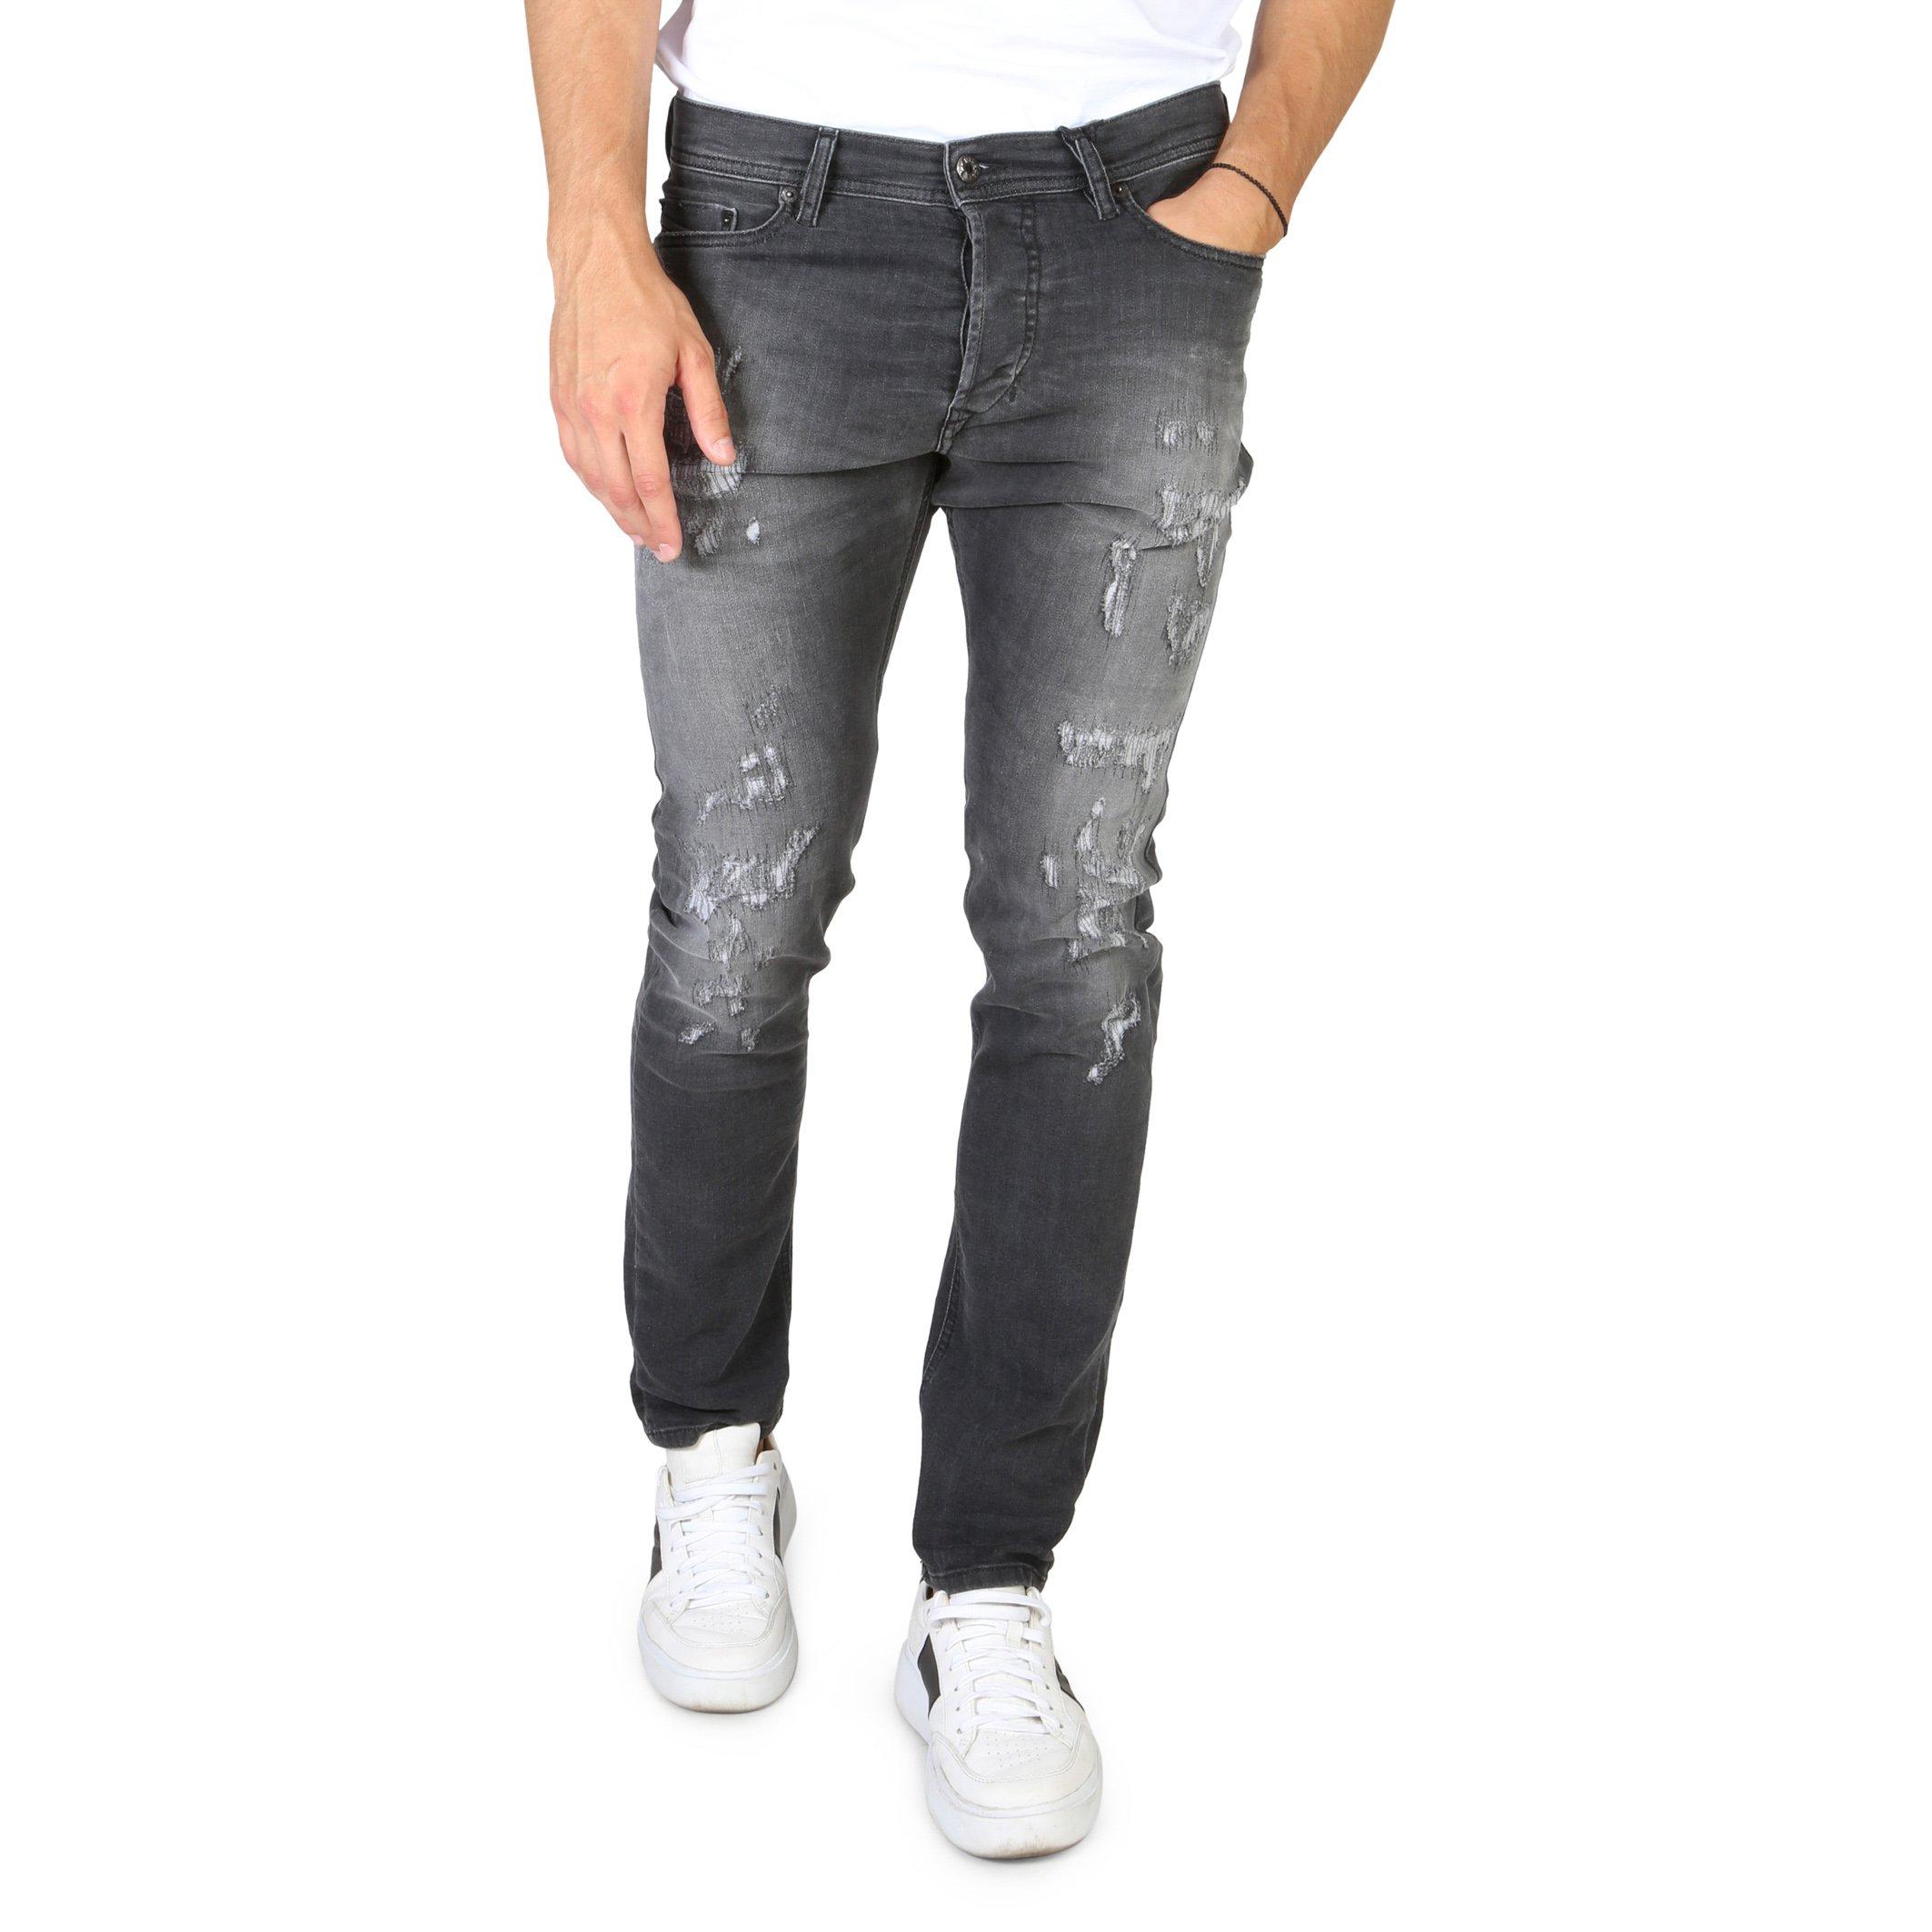 Diesel Men's Jeans Black TEPPHAR_L32_00CKRI - black 29